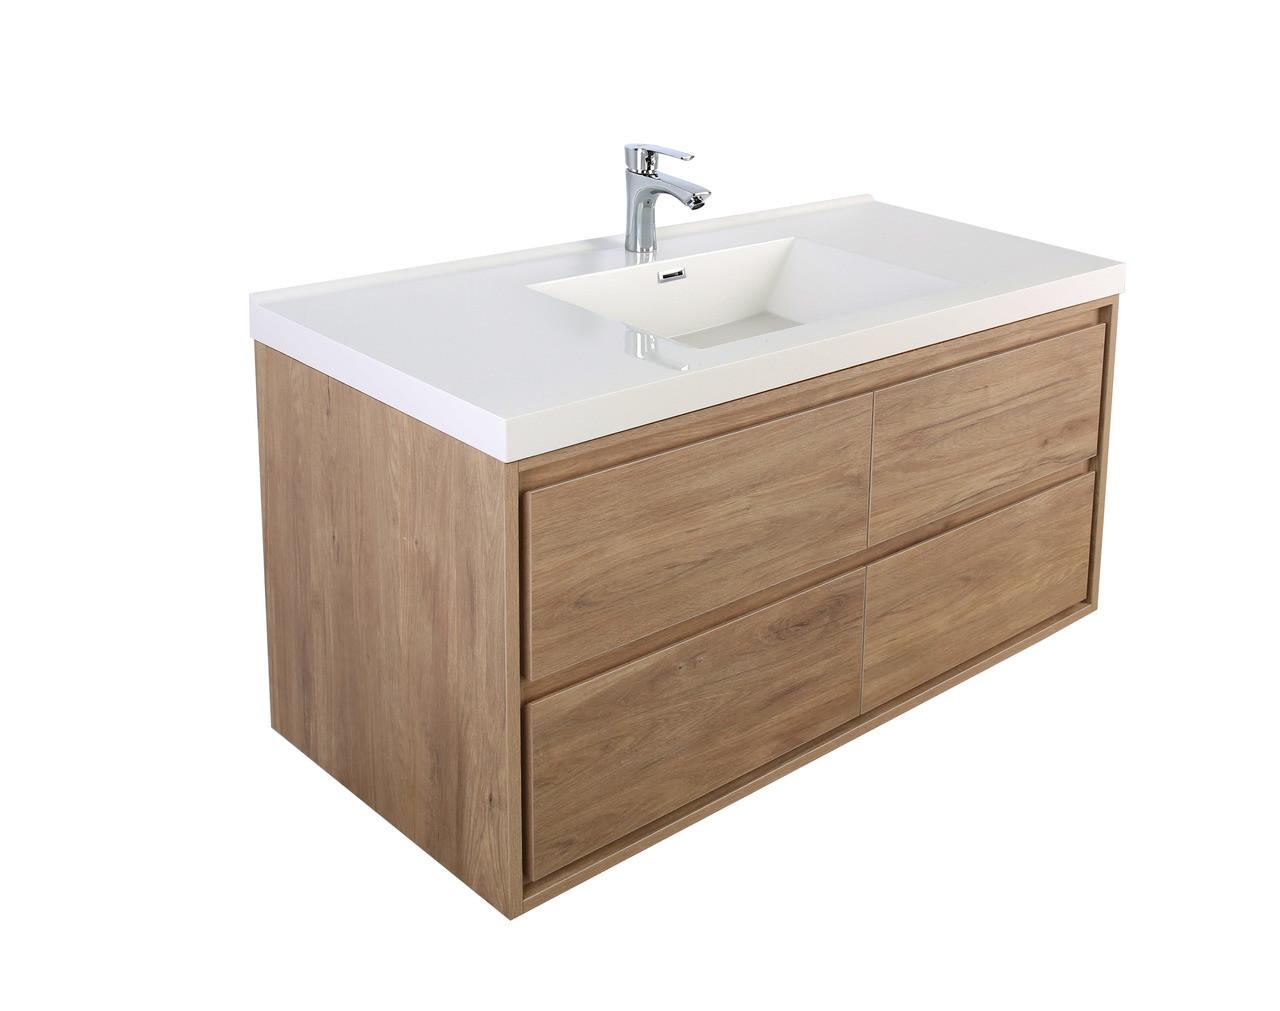 Sage 60 Single Sink Wall Mounted Modern Vanity